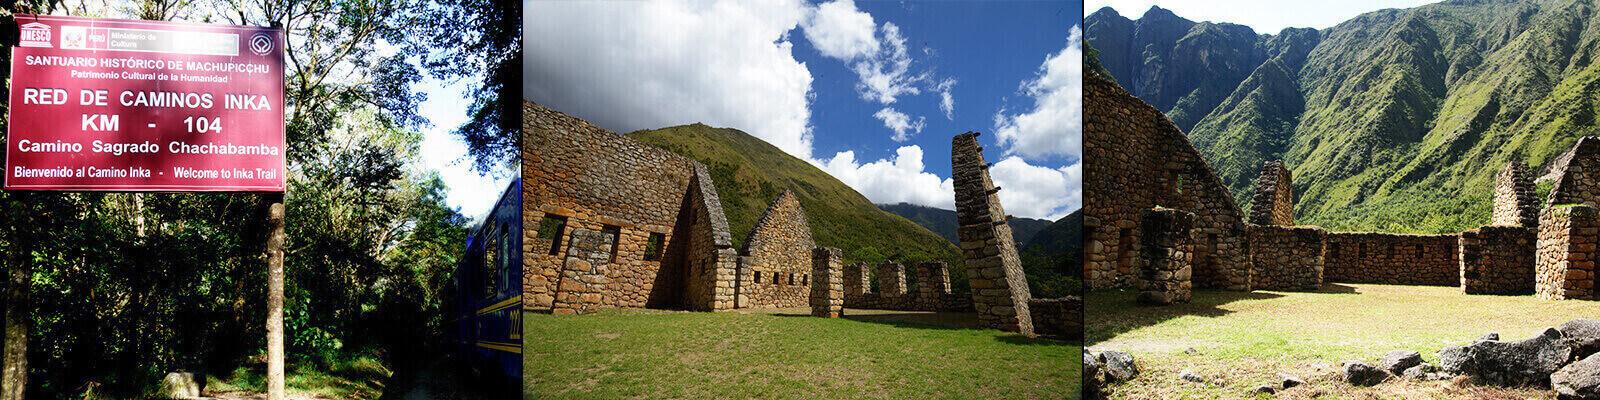 camino-inca-corto-2dias-machu-picchu-andes-tours